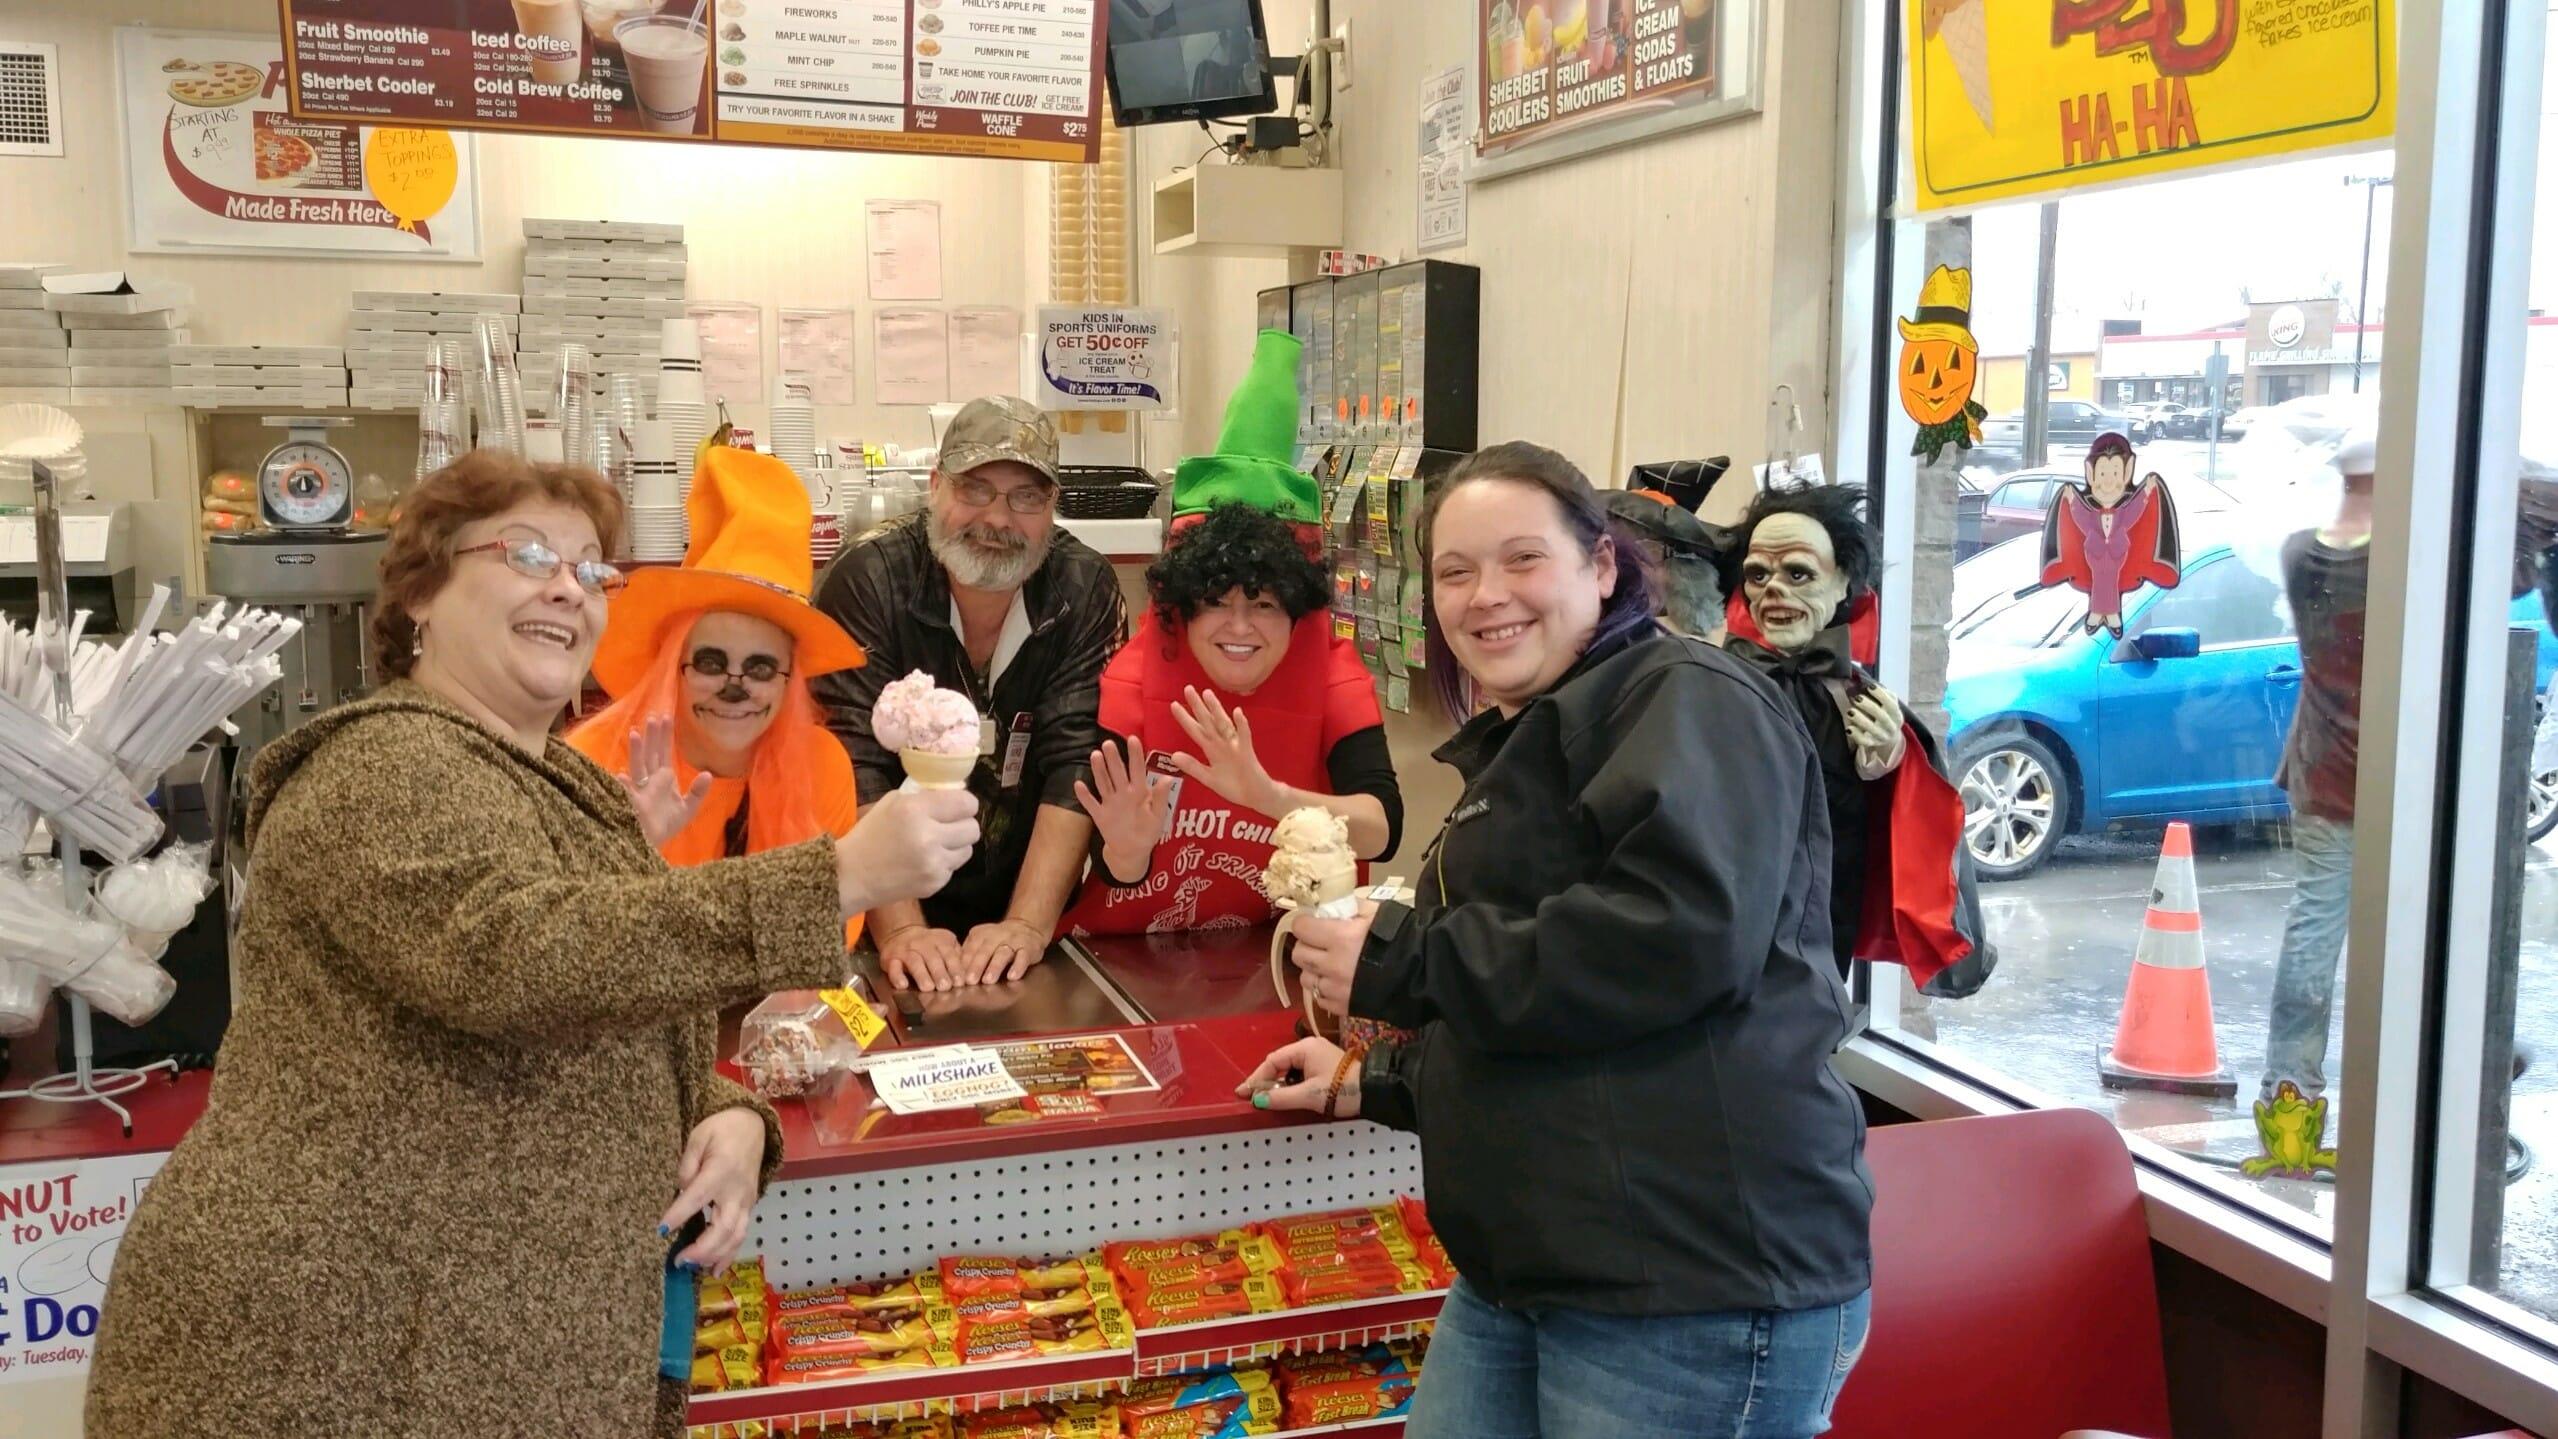 Enjoying ice cream at Stewart's